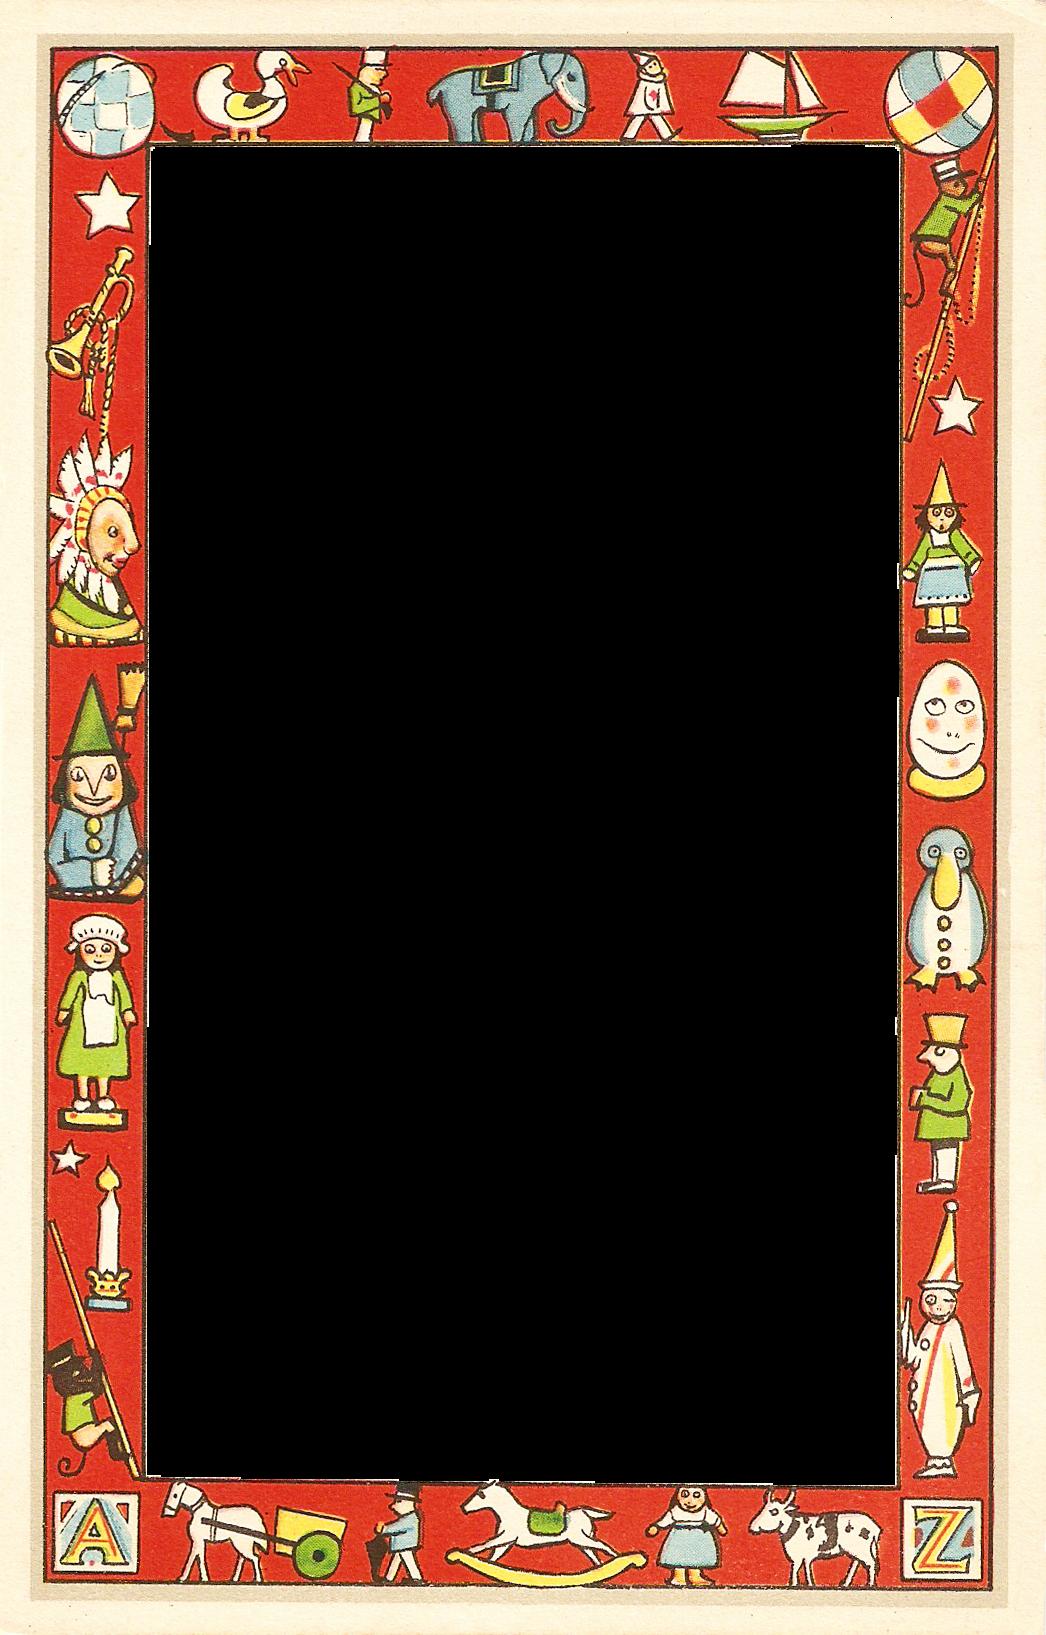 Cat nip clipart royalty free stock CatnipStudioCollage-: Free Christmas Clip Art - Vintage Santa and ... royalty free stock